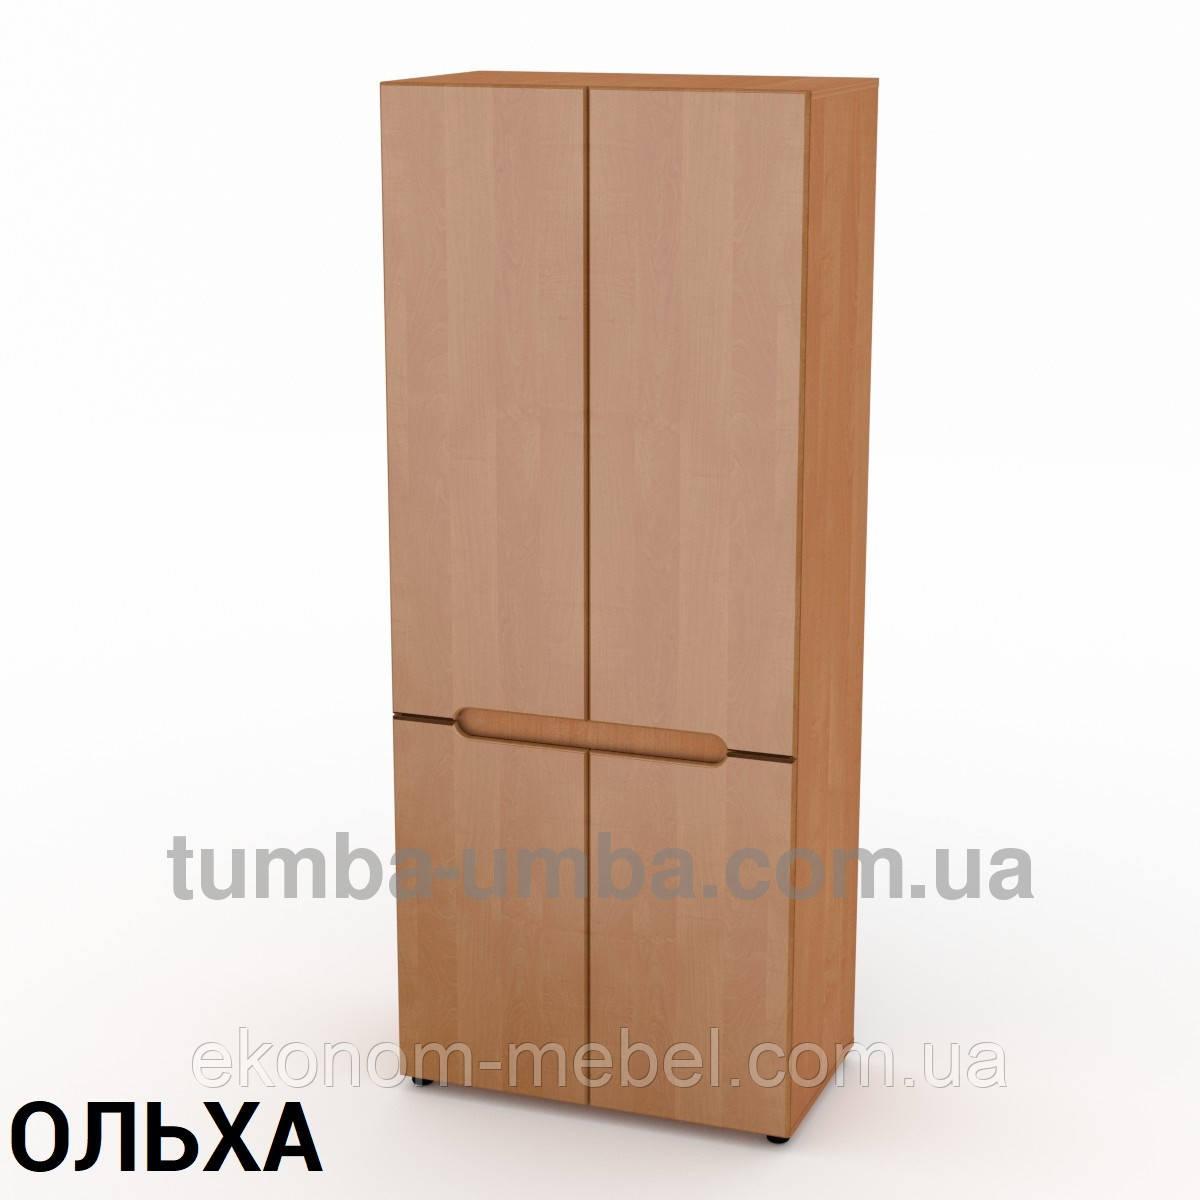 Шкаф-23 МДФ